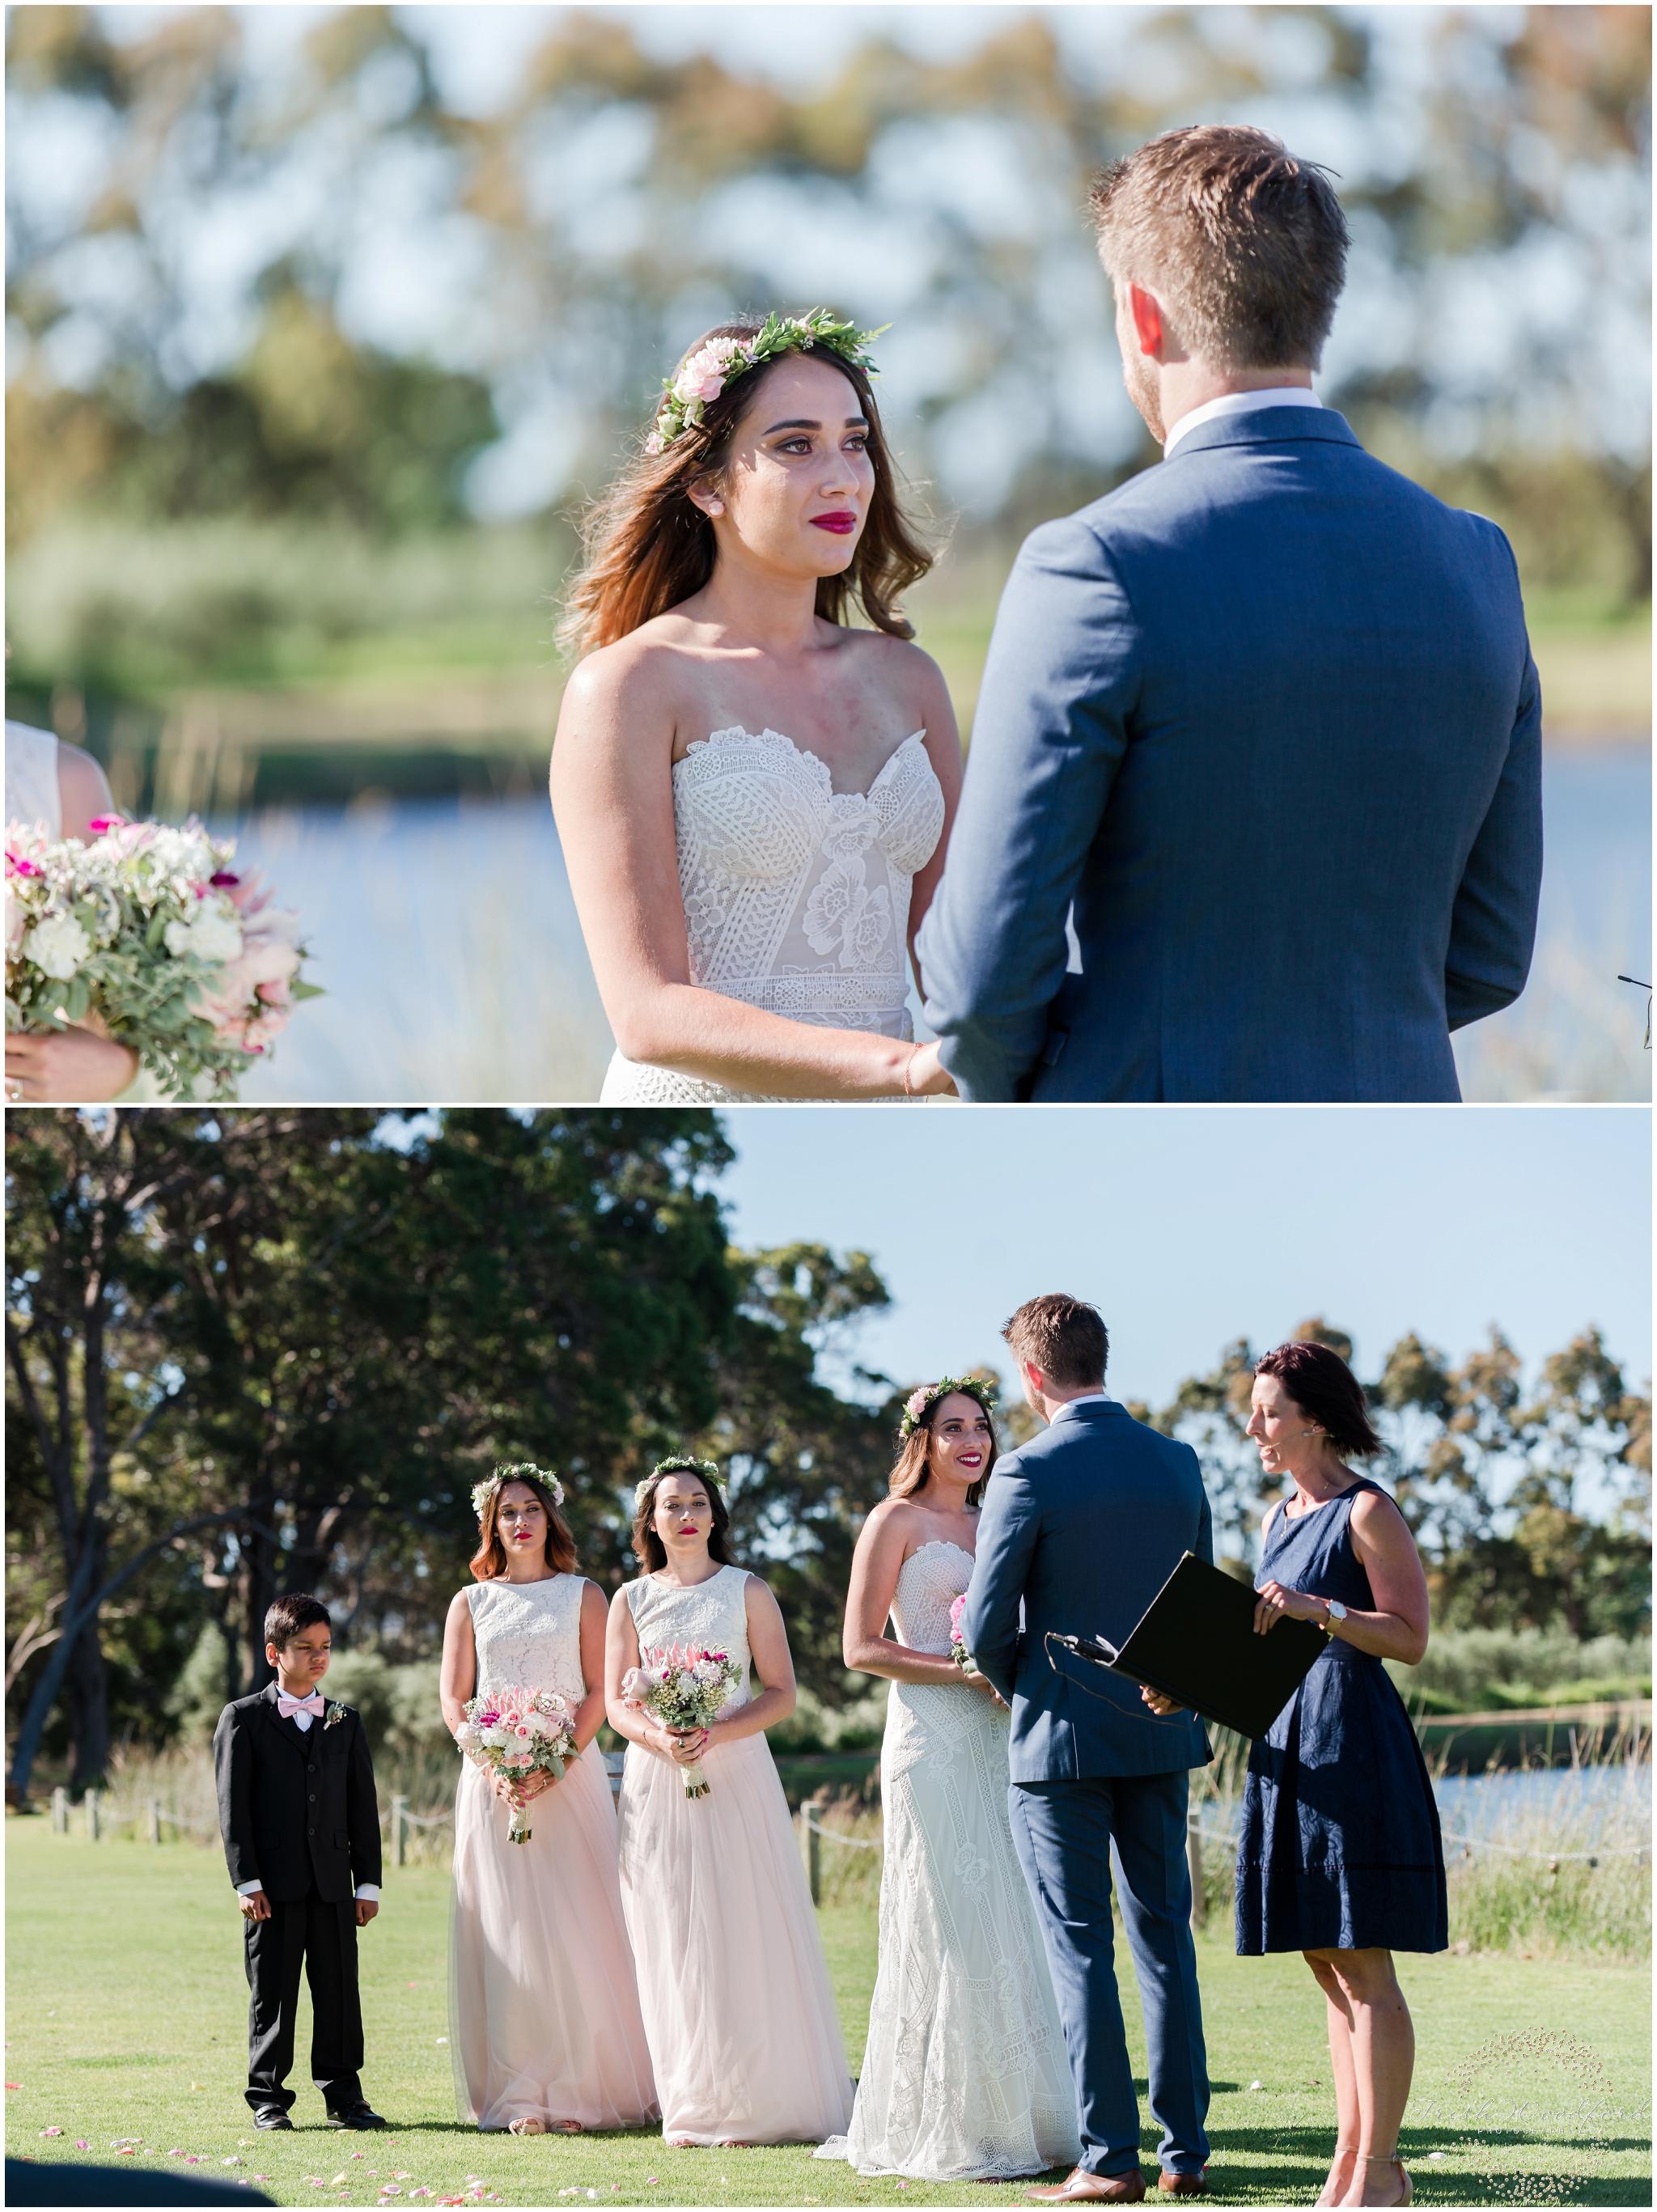 Laurance Wine Weddings Margaret River